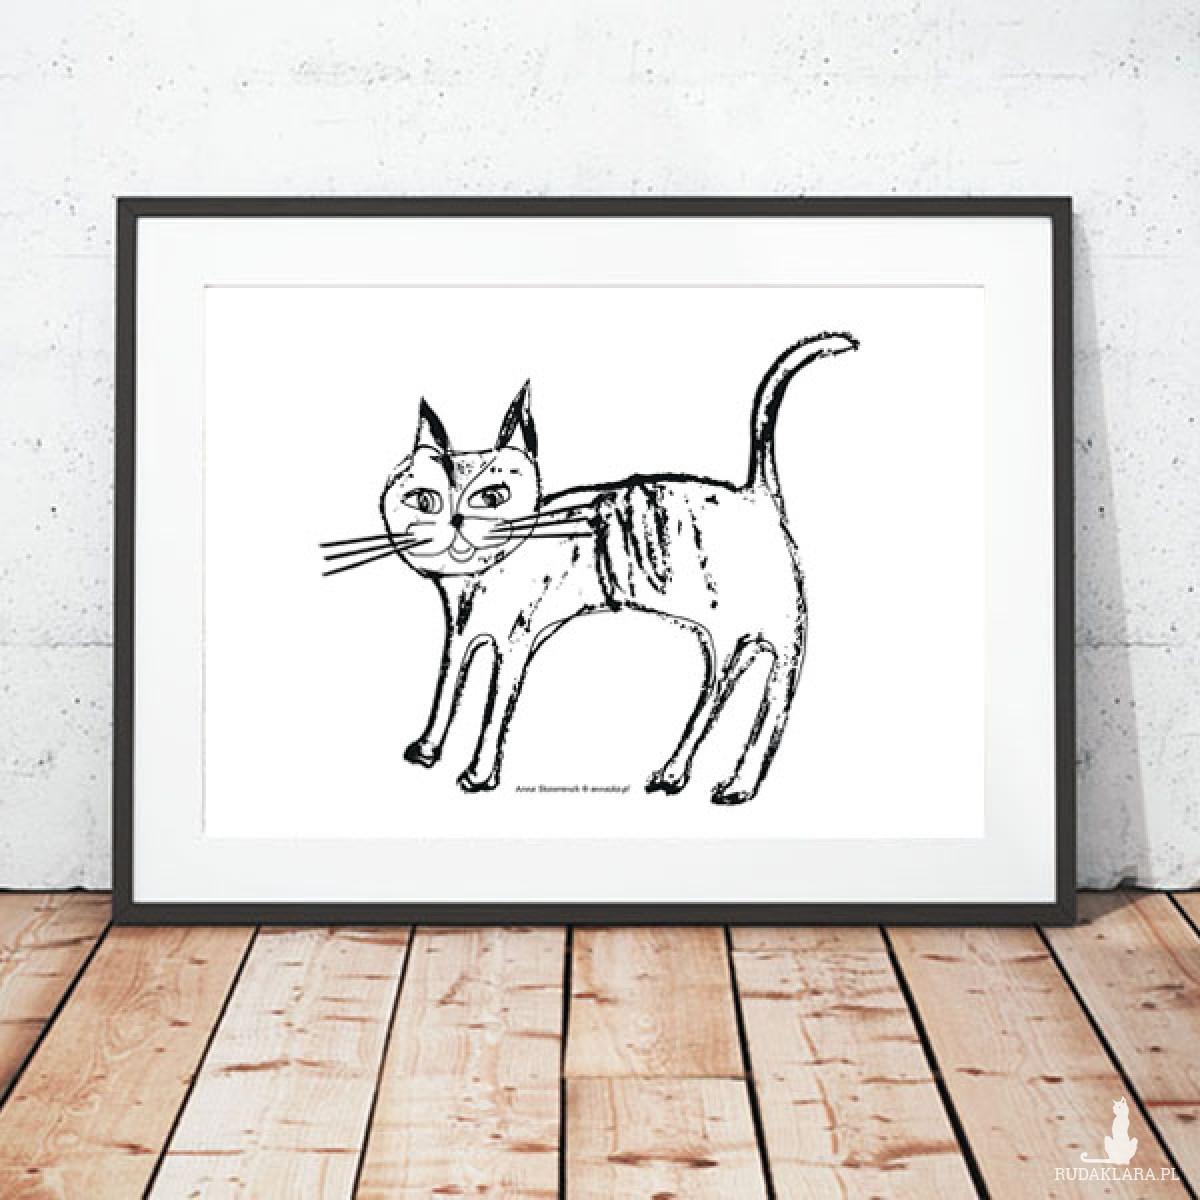 plakat z kotkiem, kotek plakat, biało czarny plakat, grafika z kotem